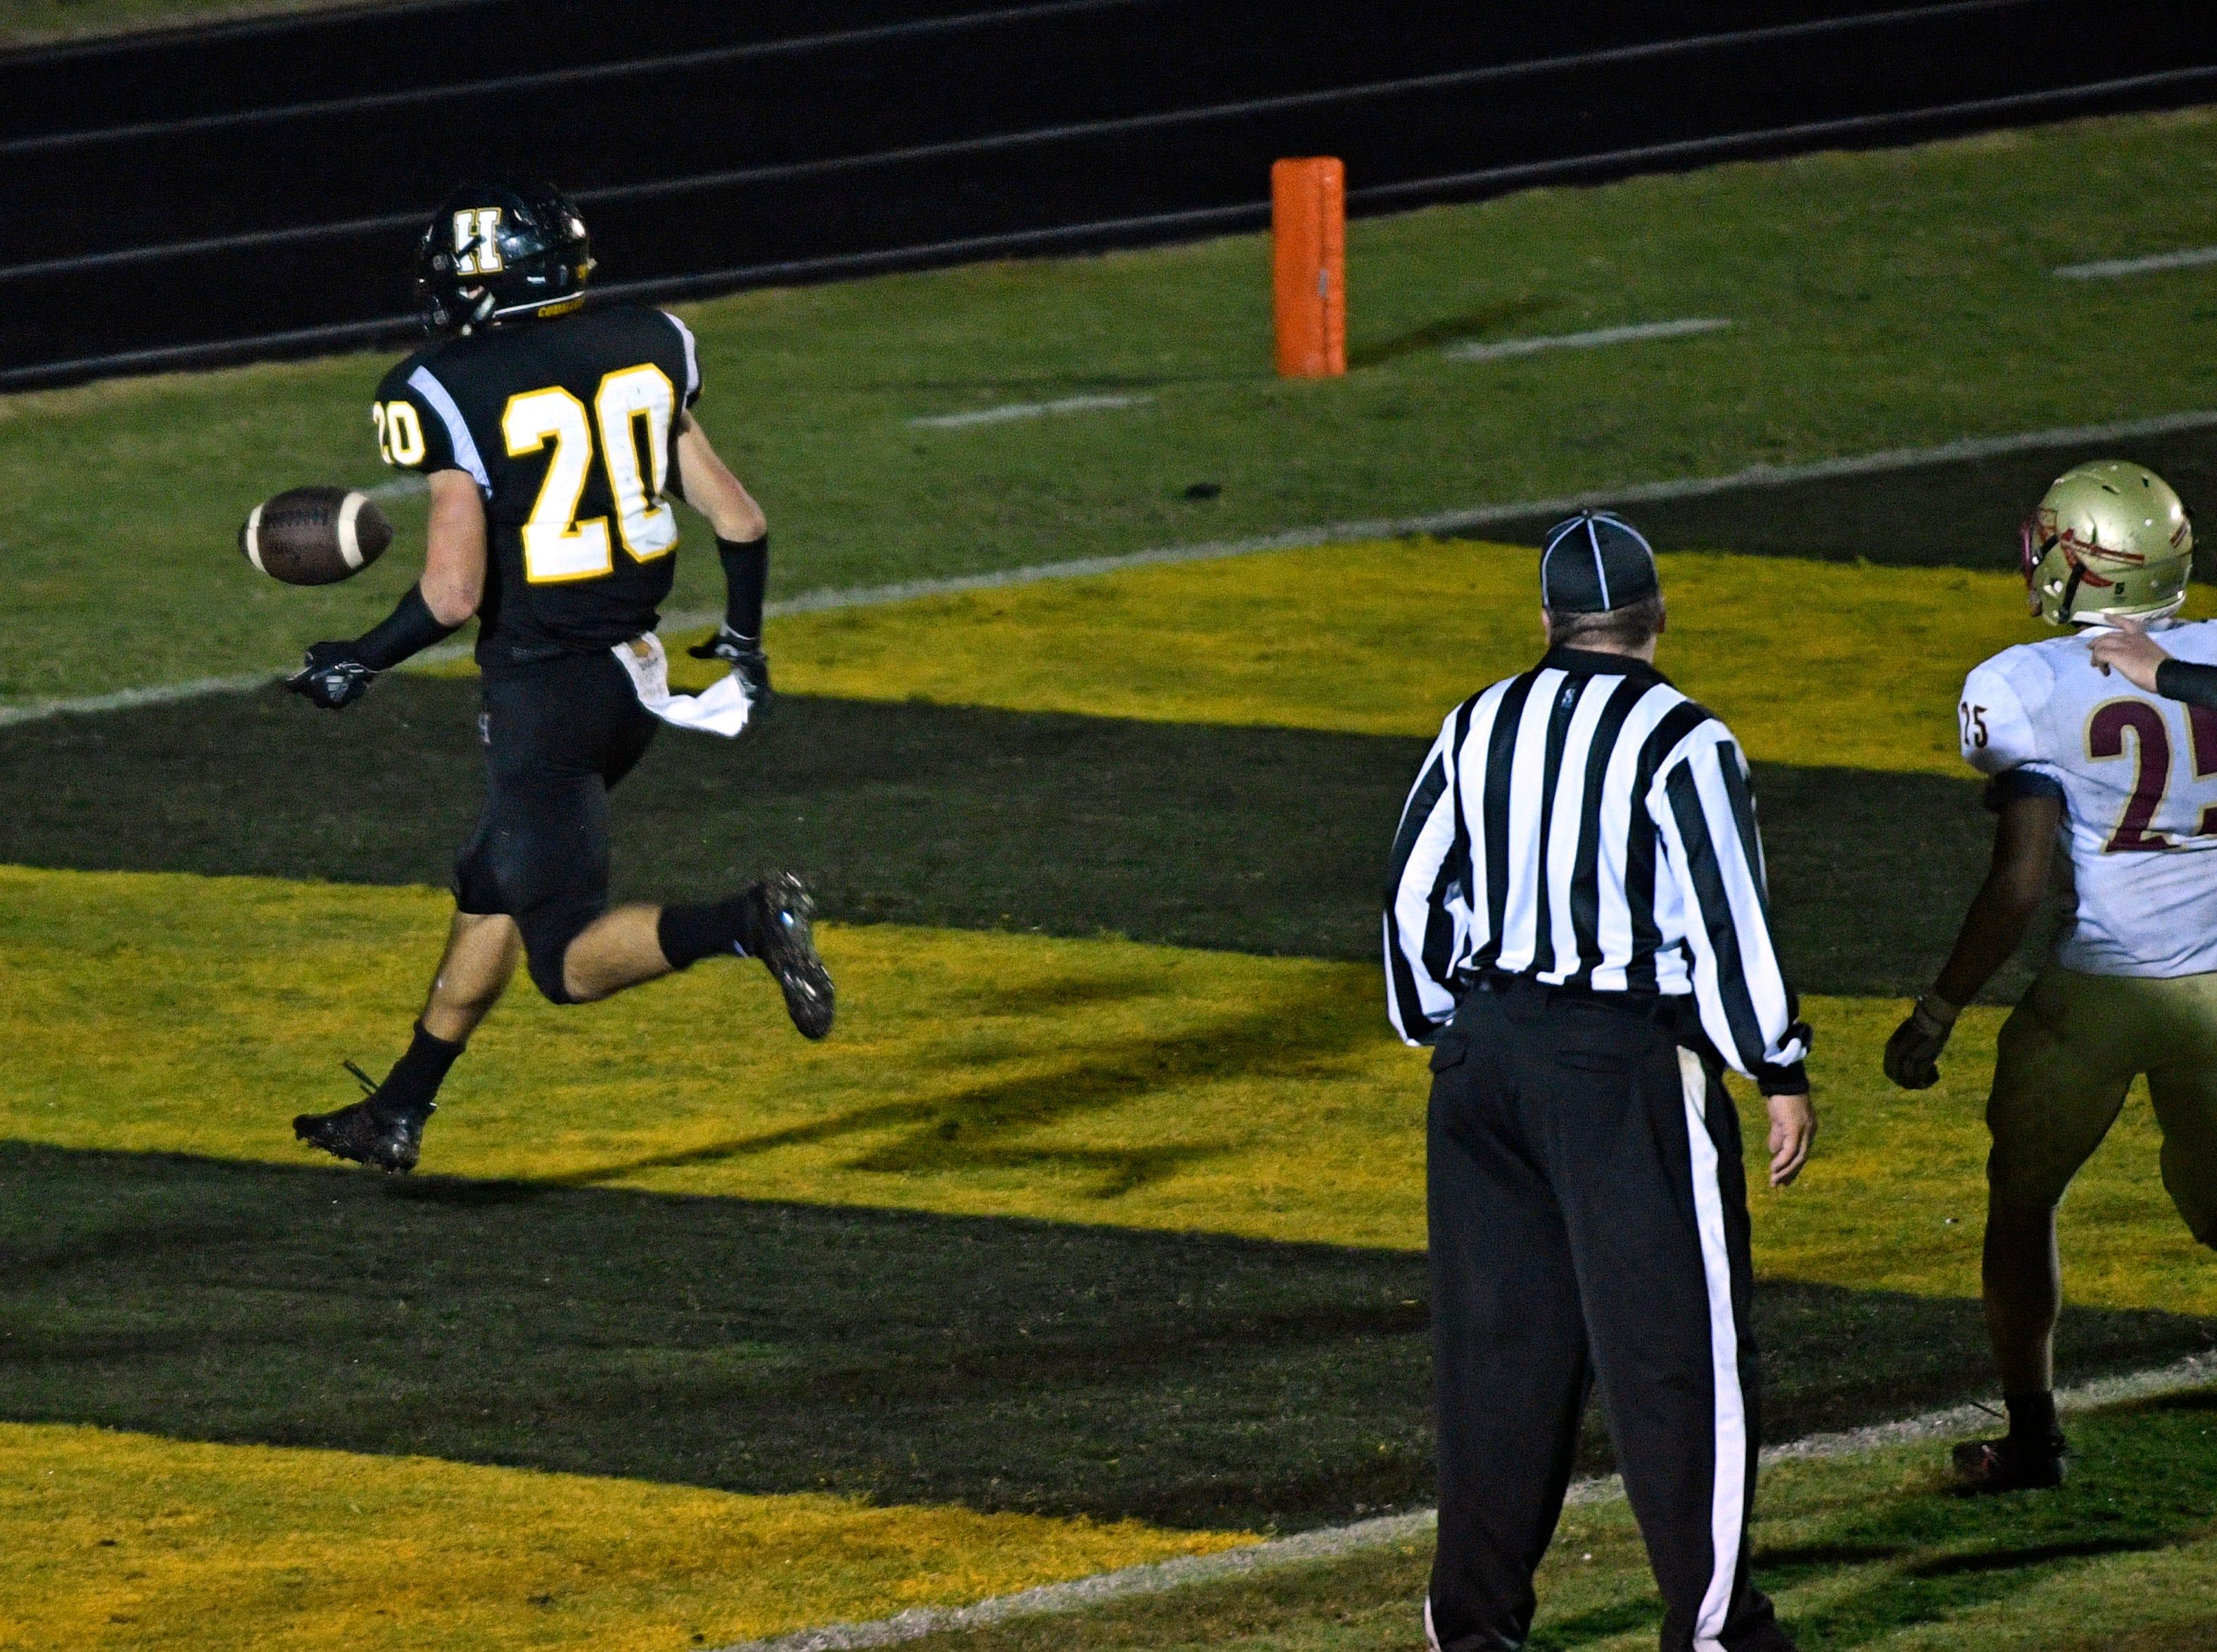 Nate Hancock is all alone as he scores Hendersonville's final touchdown to make it 23-14 Friday Nov. 2, 2018, in Hendersonville, Tenn.